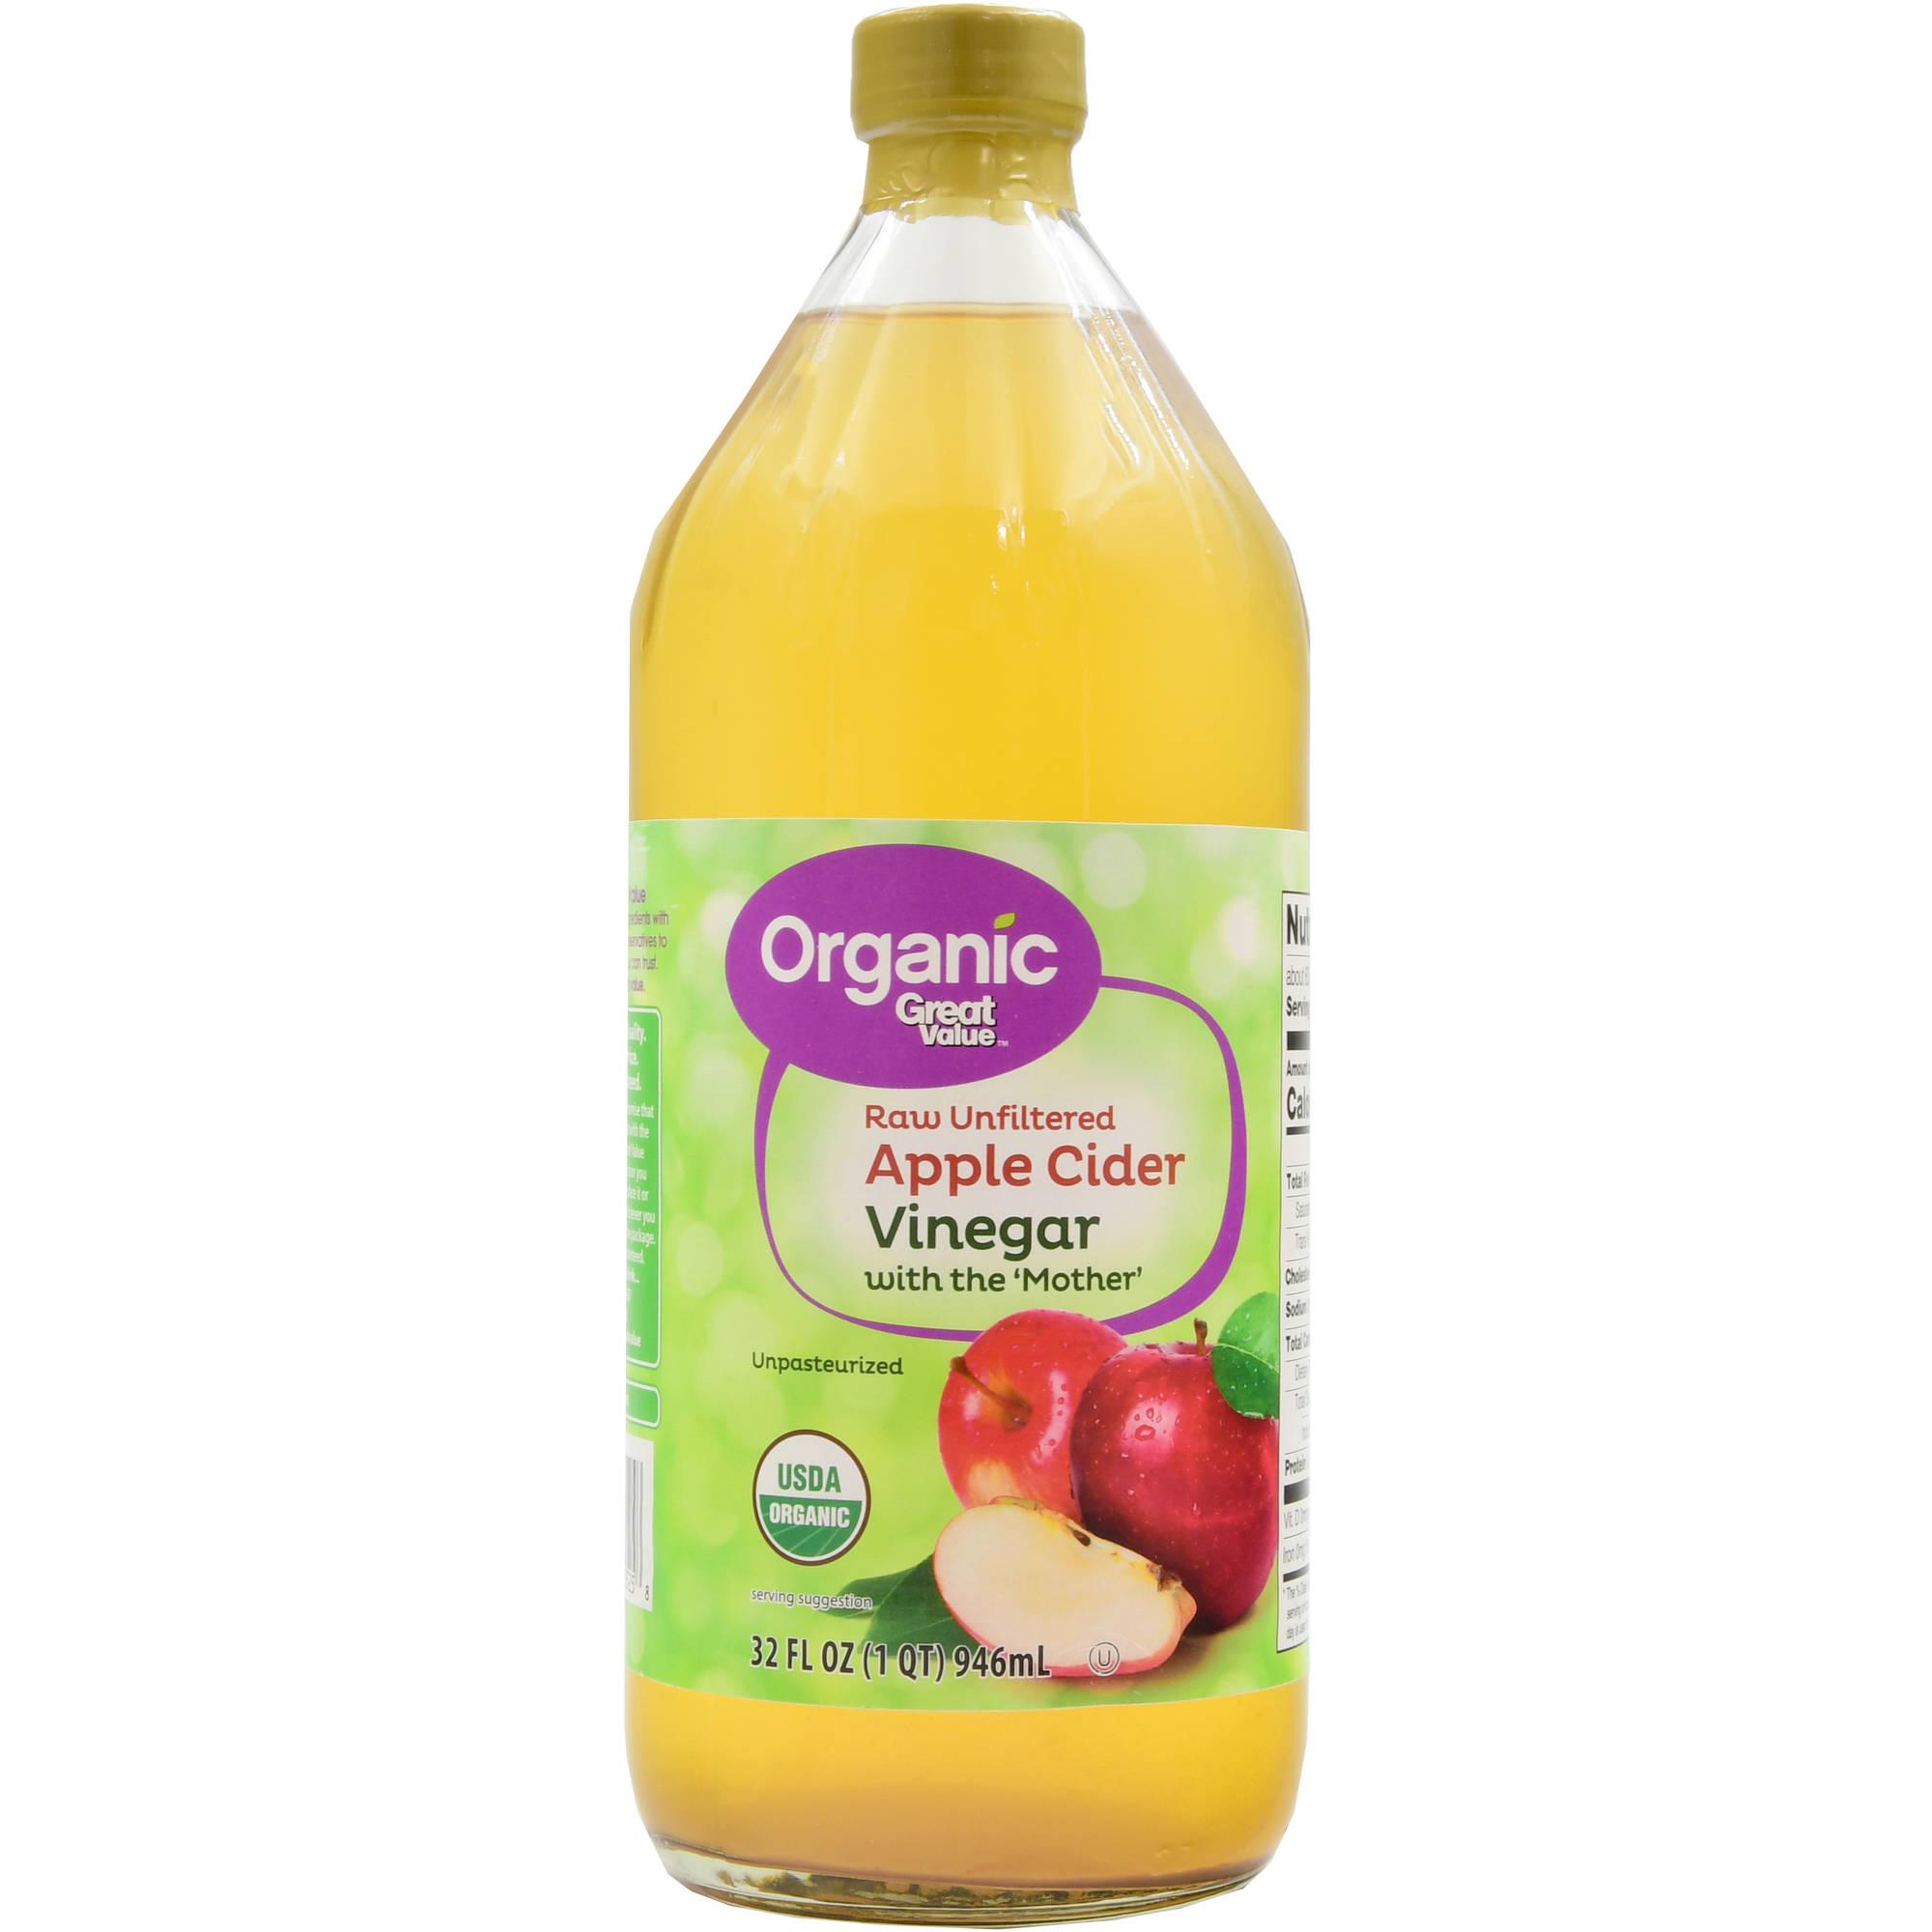 (2 Pack) Great Value Organic Raw Unfiltered Apple Cider Vinegar, 32 fl oz